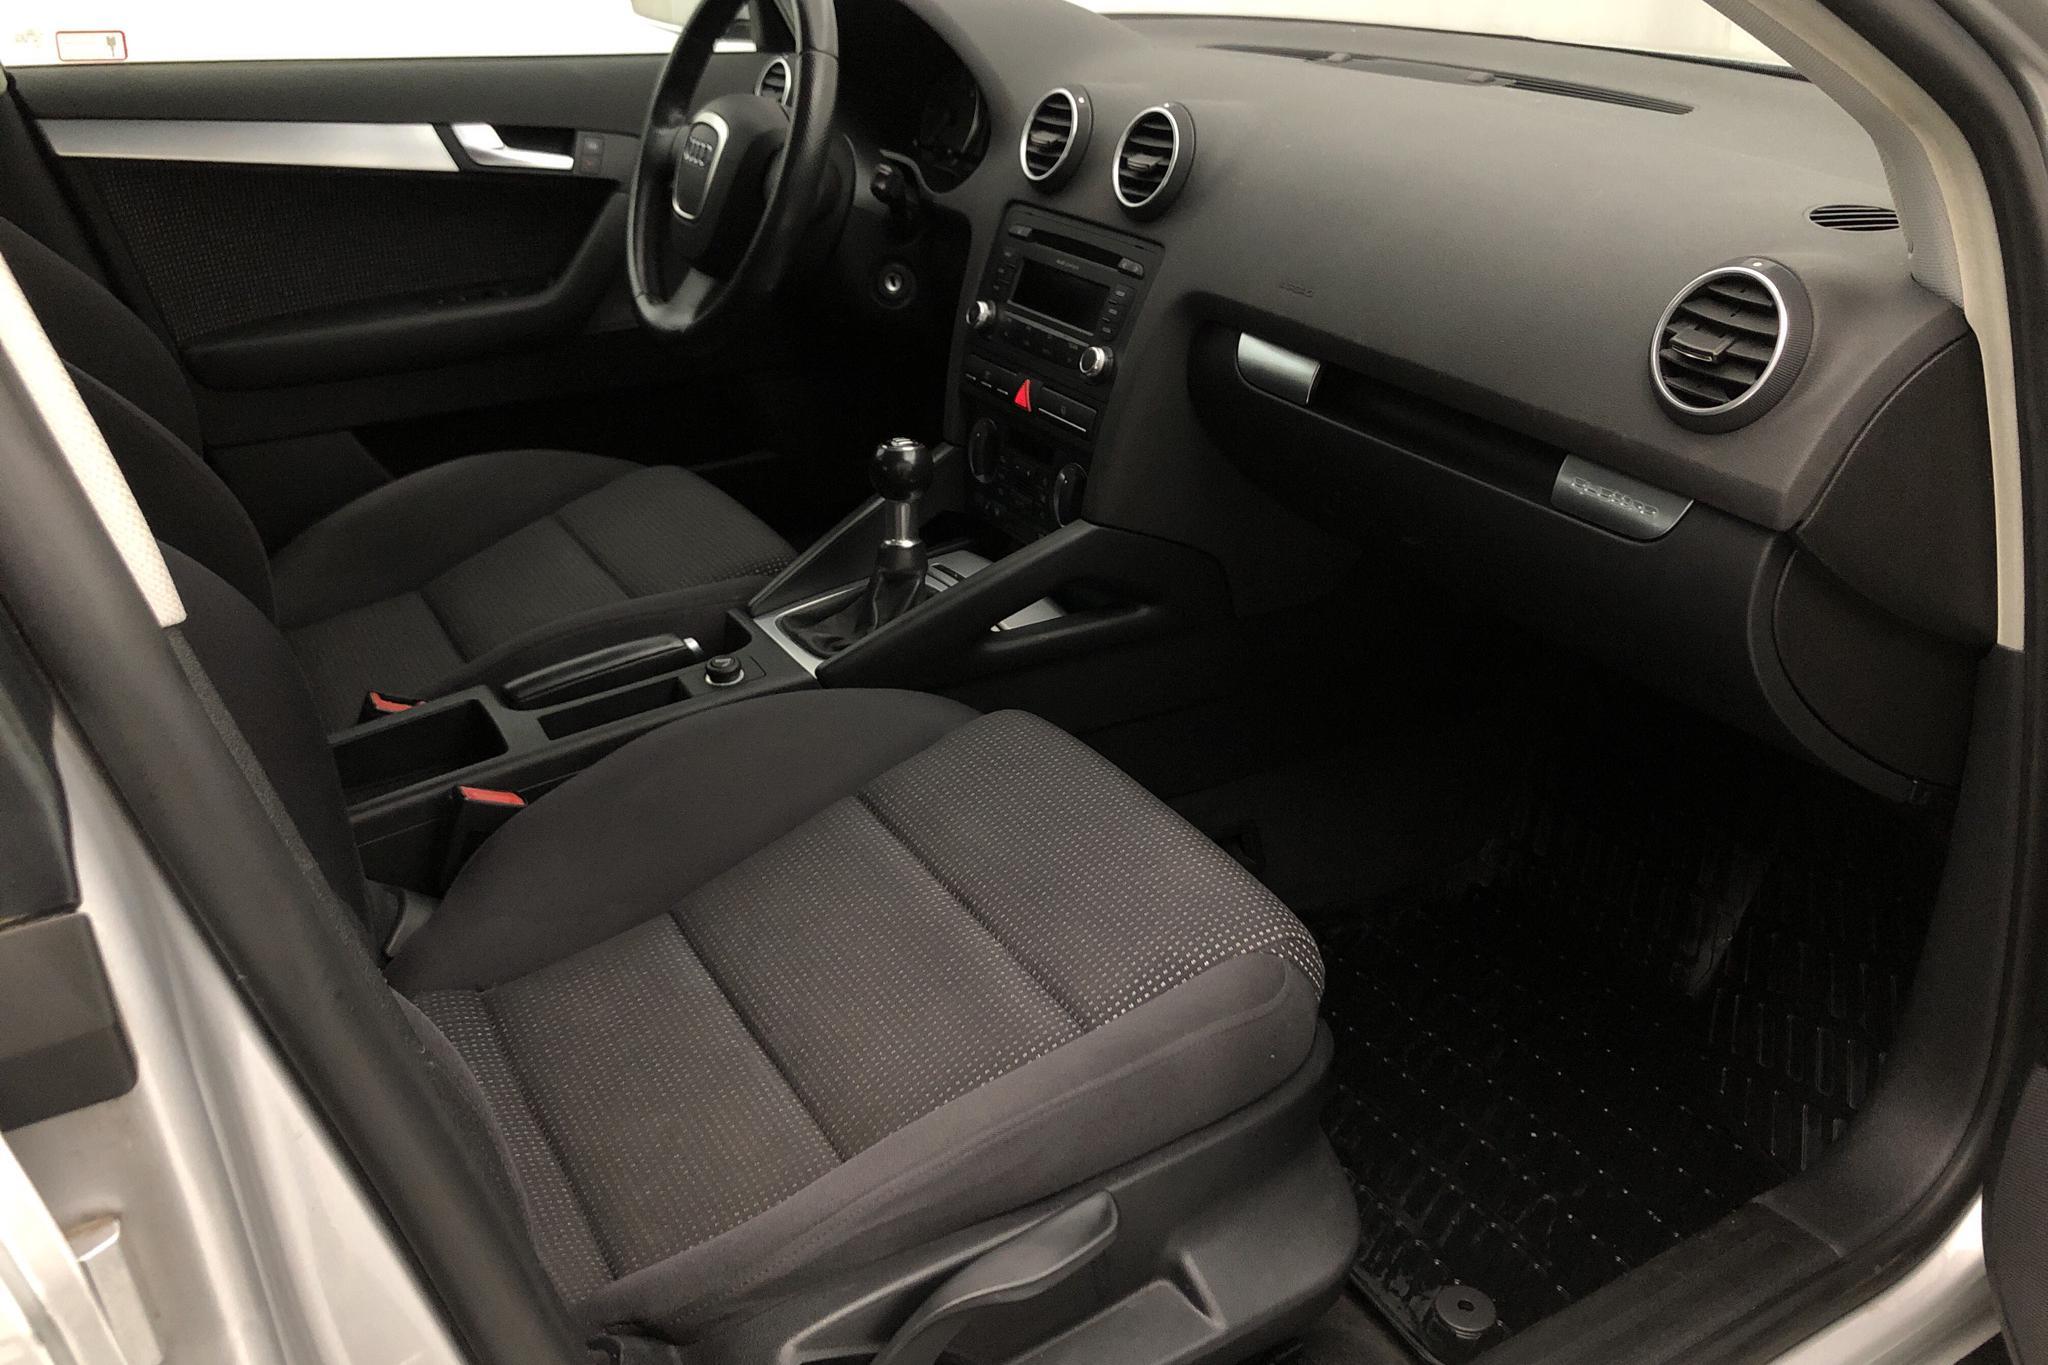 Audi A3 2.0 TDI Sportback quattro (170hk) - 151 410 km - Manual - silver - 2008